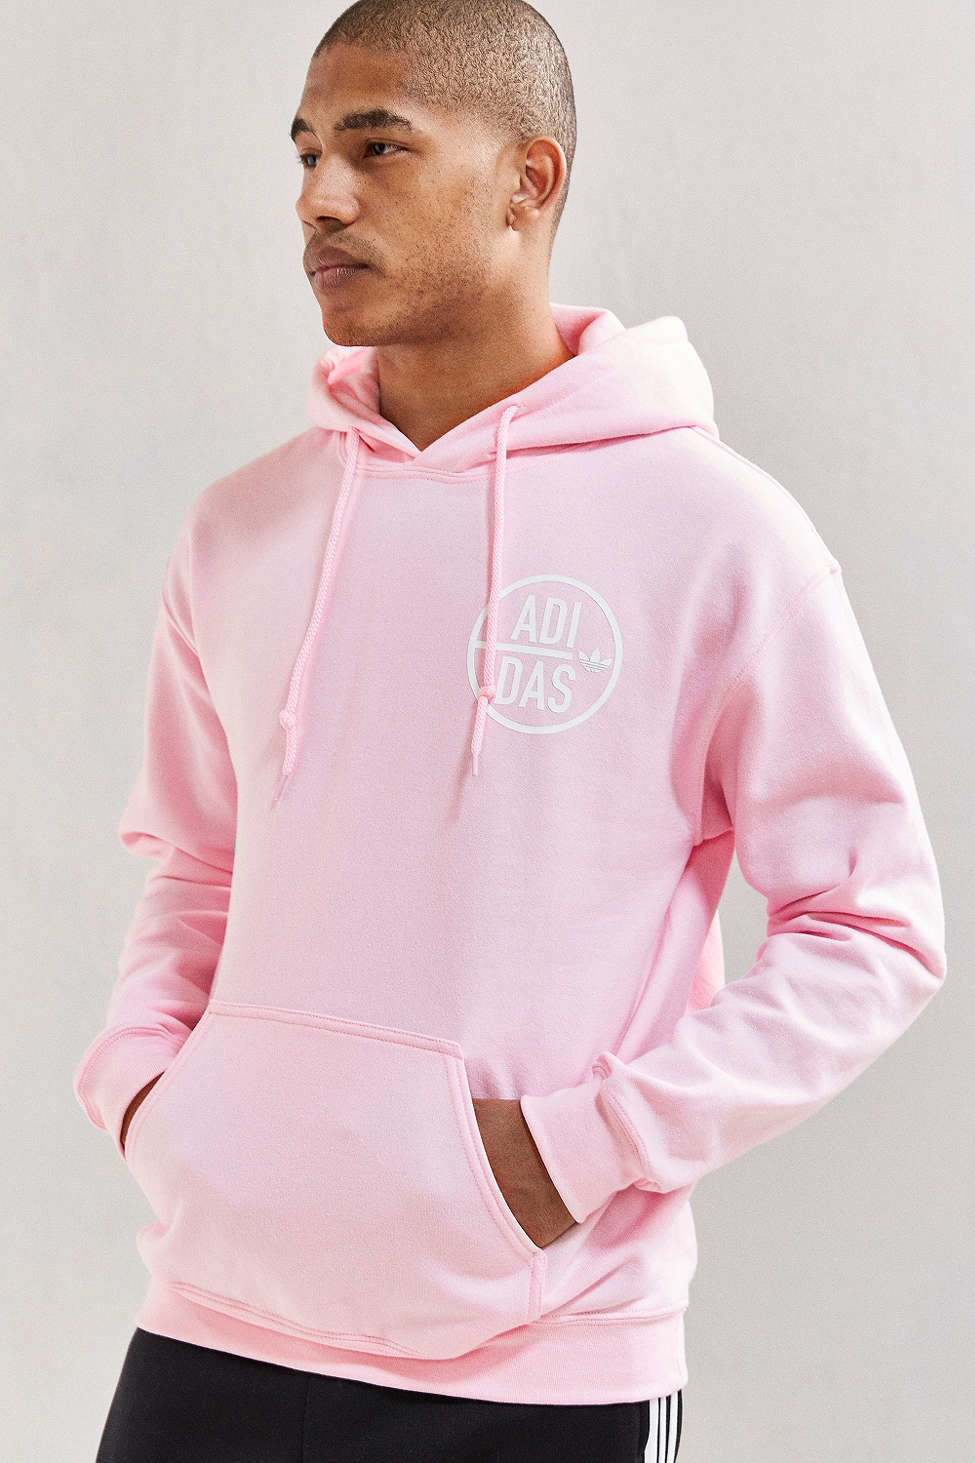 Men Adidas Pink Sweatshirt Back Hoodie Originals Again For IbvY6yf7gm